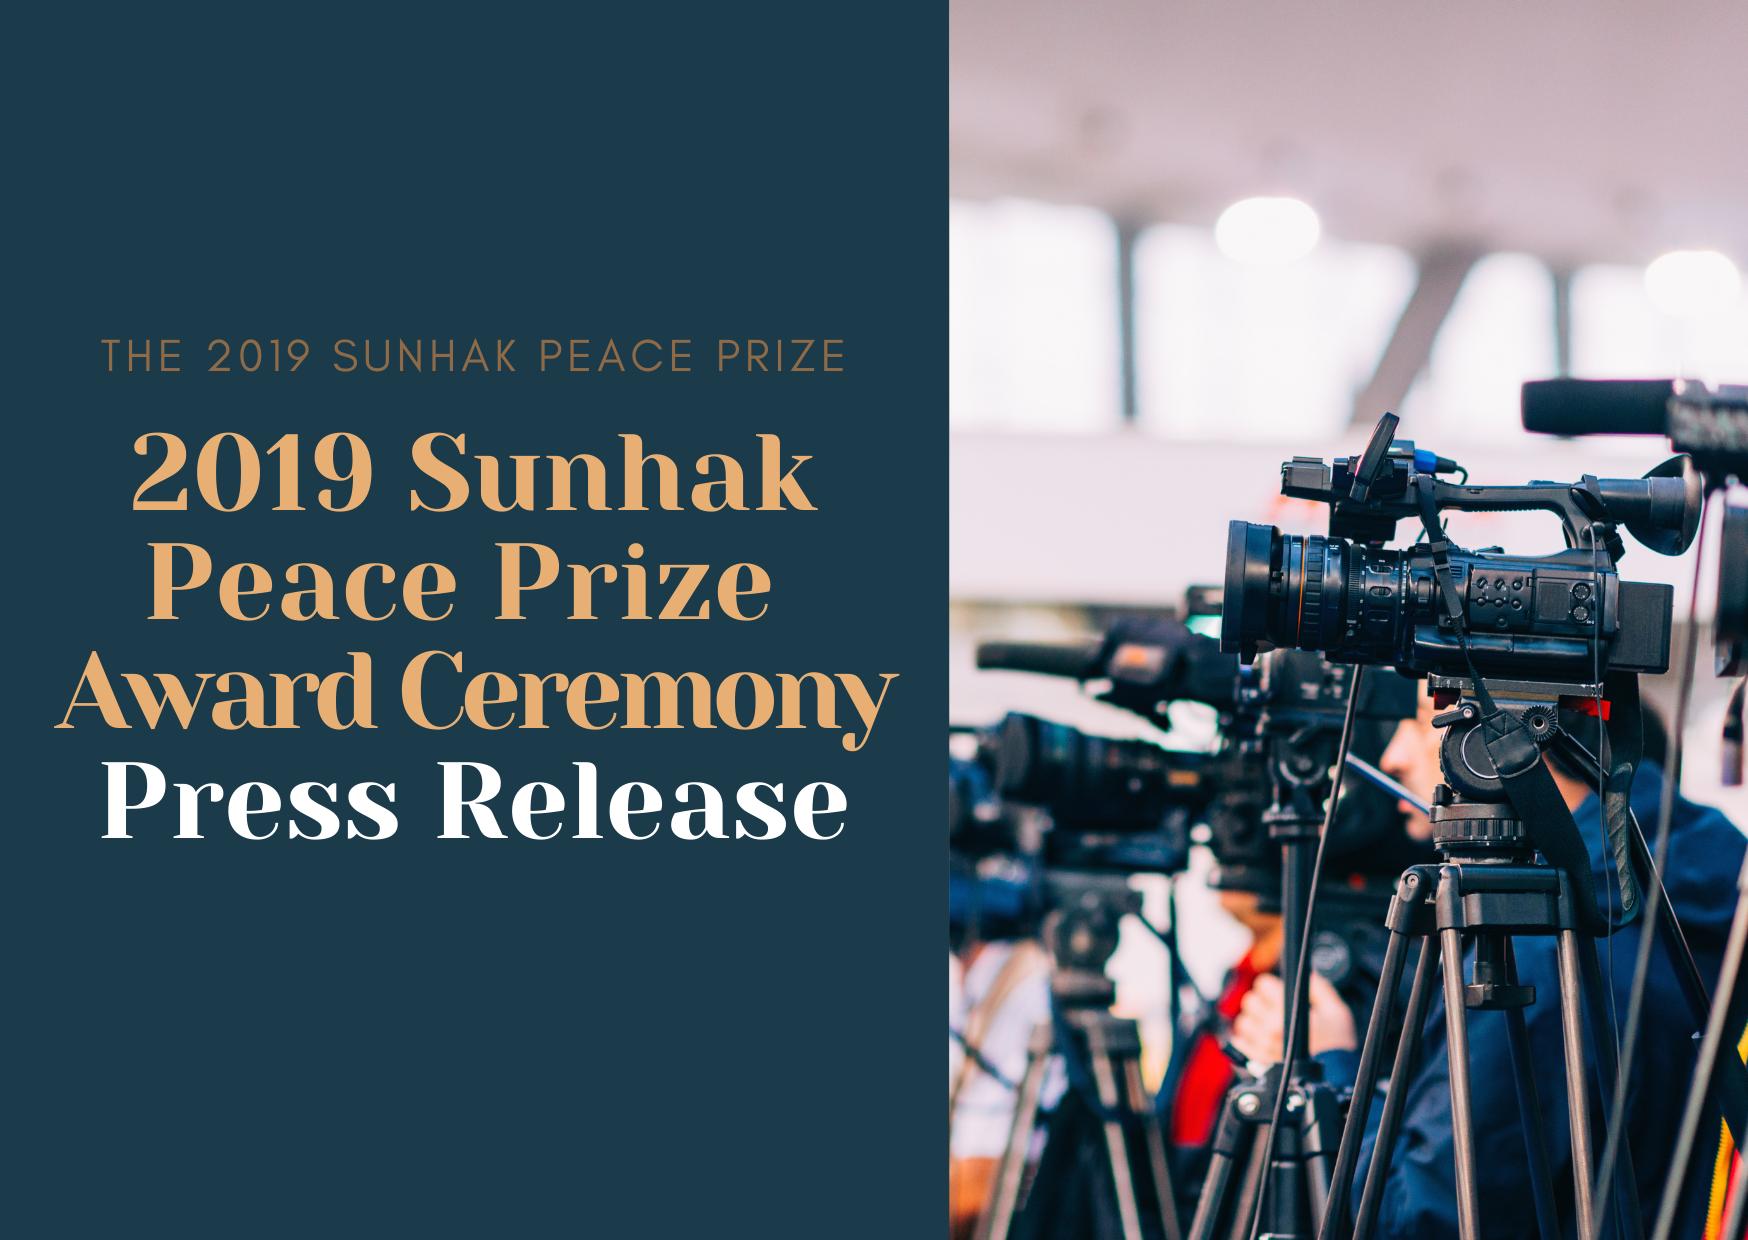 [Press Release] The Sunhak Peace Prize for 2019 Convened in Seoul, South Korea Awarding Akinwumi Ade 썸네일